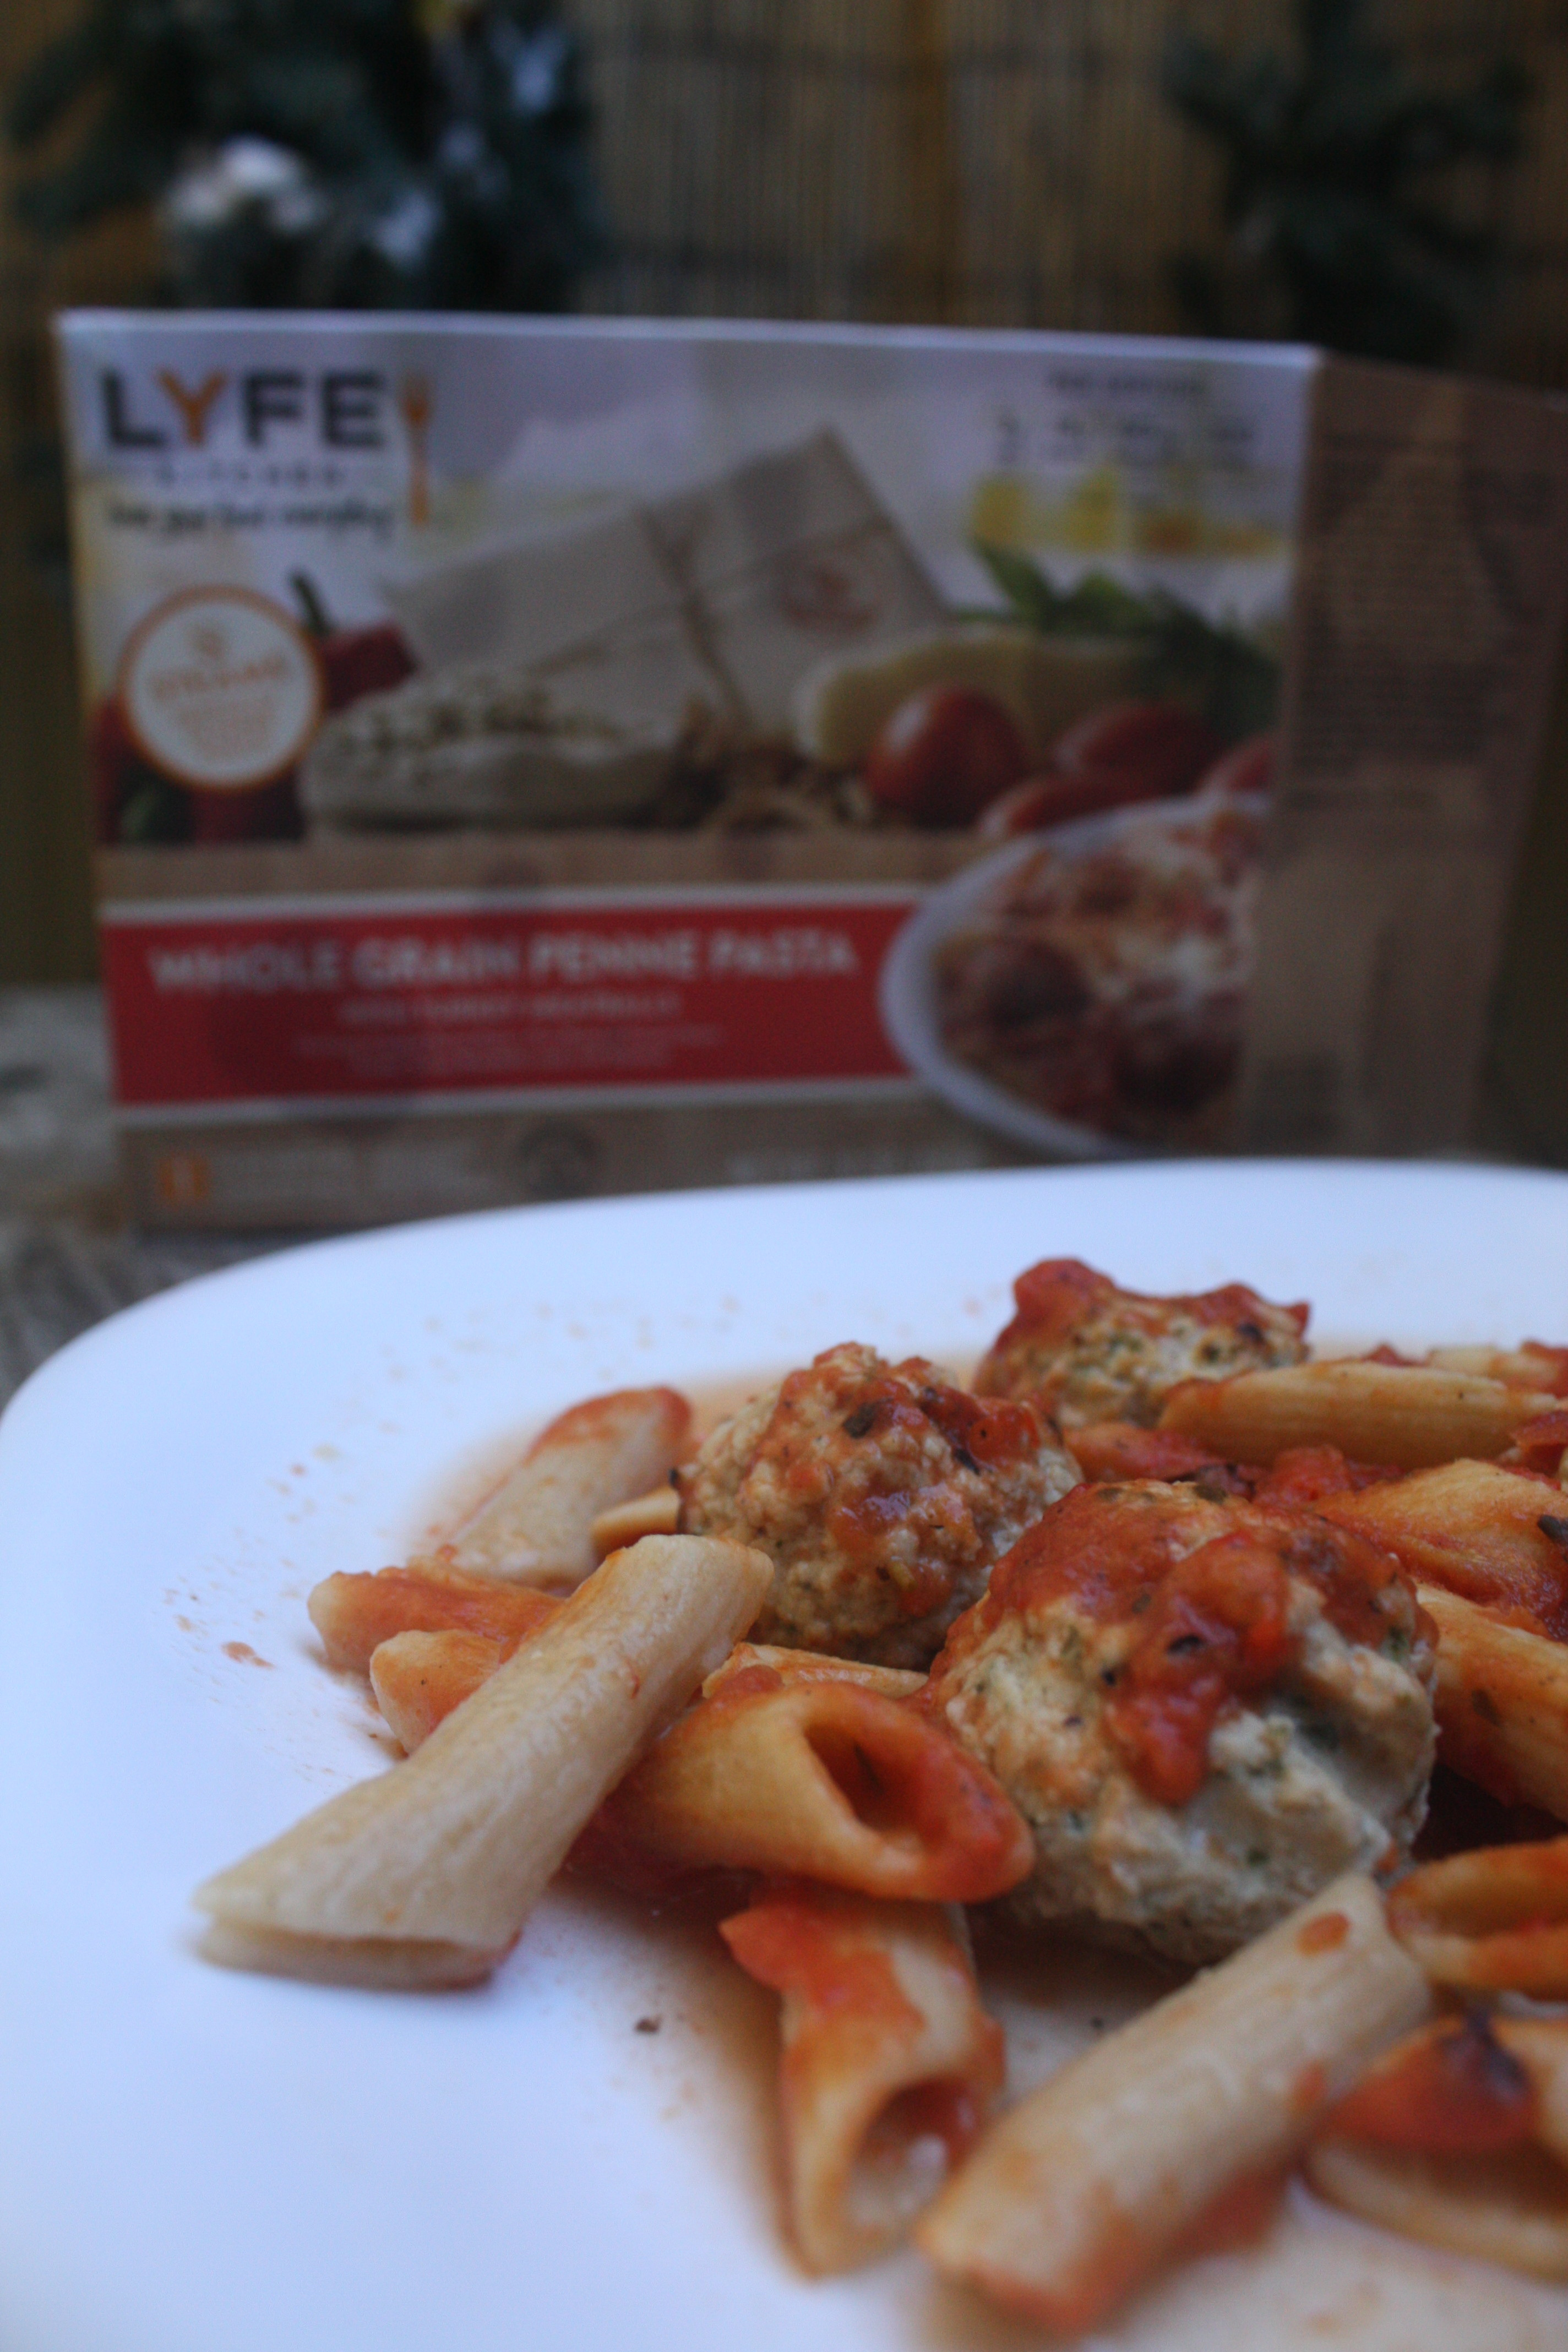 Lyfe Kitchen Frozen Meals!Minnesota Girl in the World